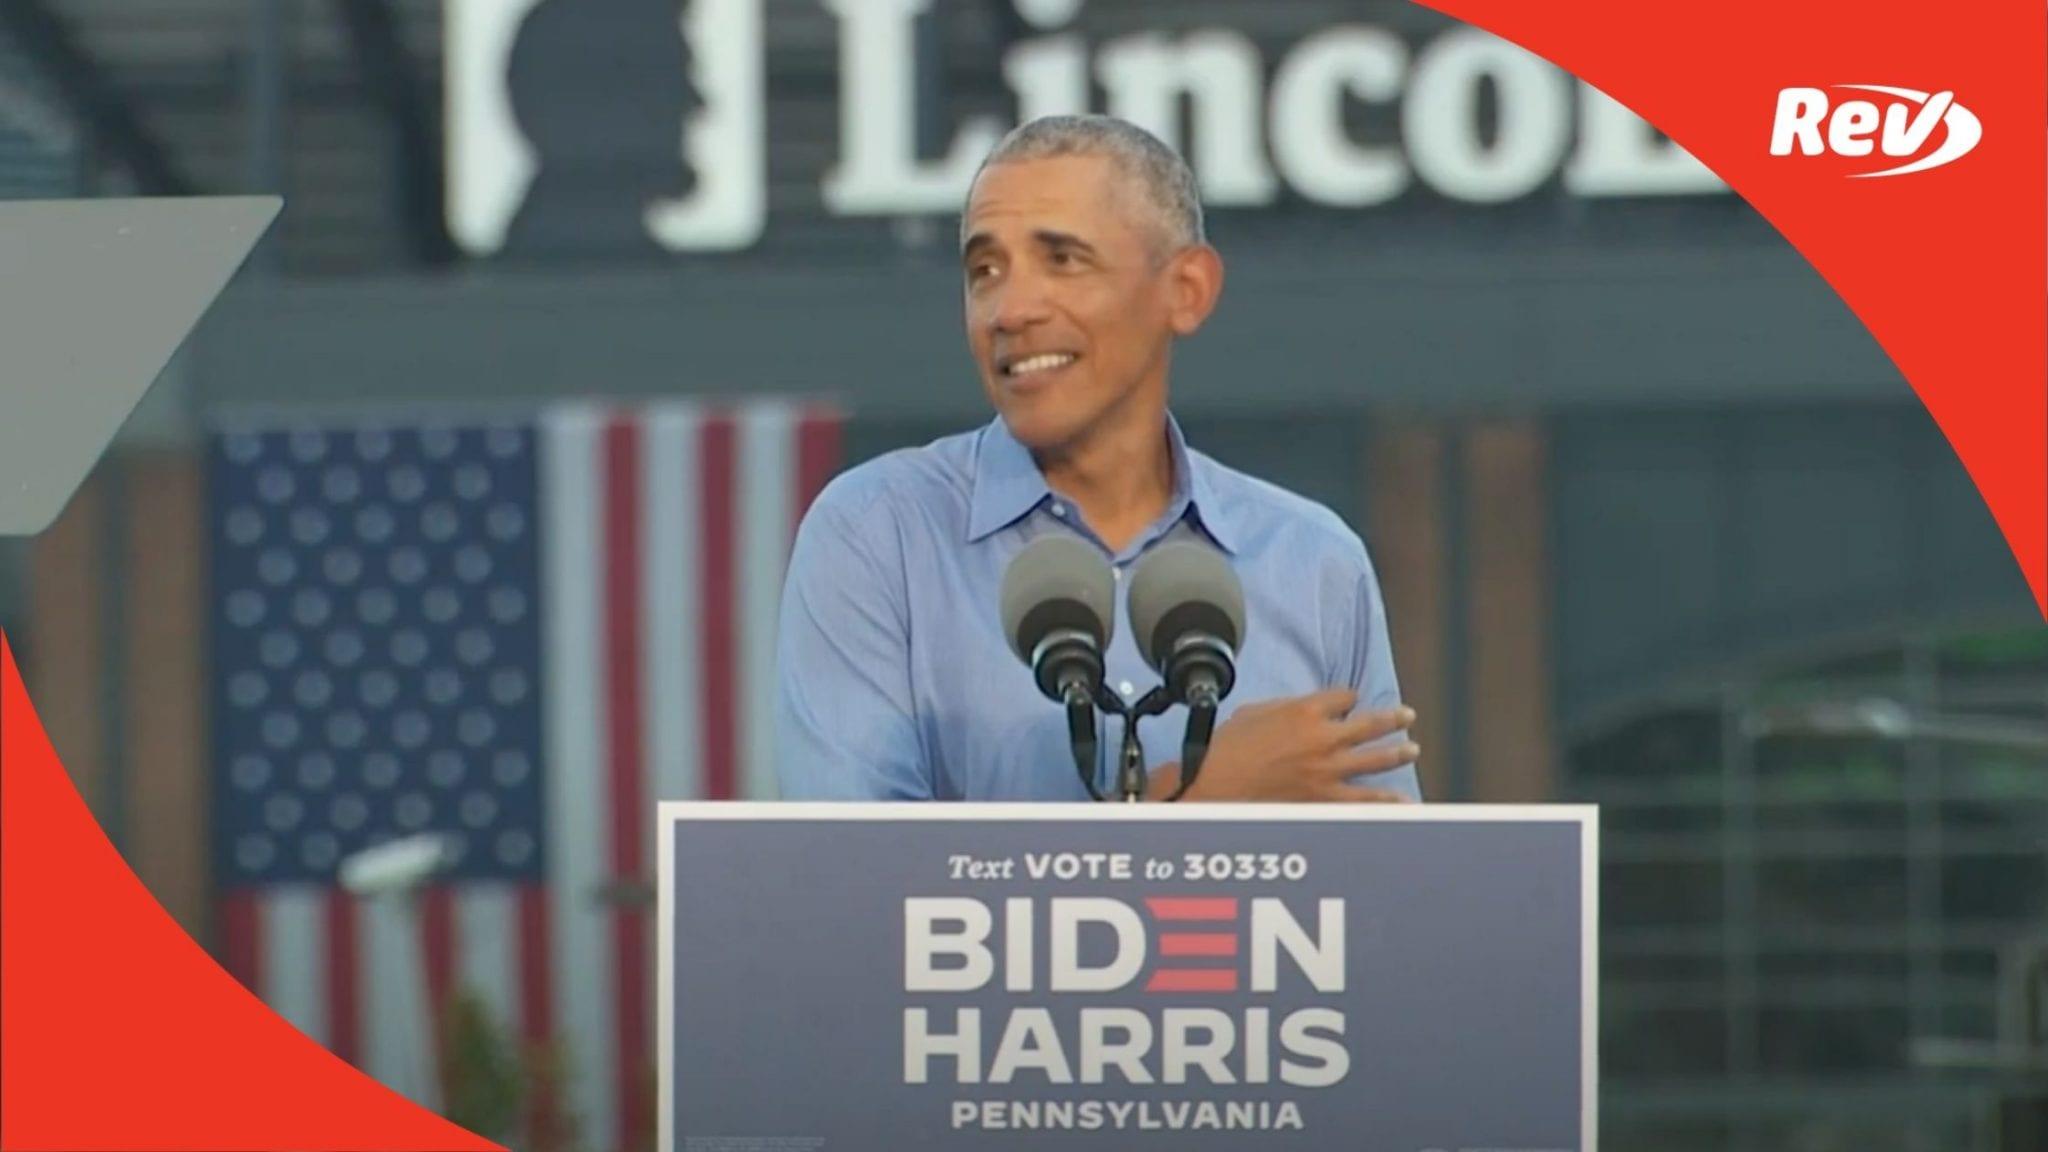 Barack Obama Campaign Rally for Joe Biden & Kamala Harris Speech Transcript October 21